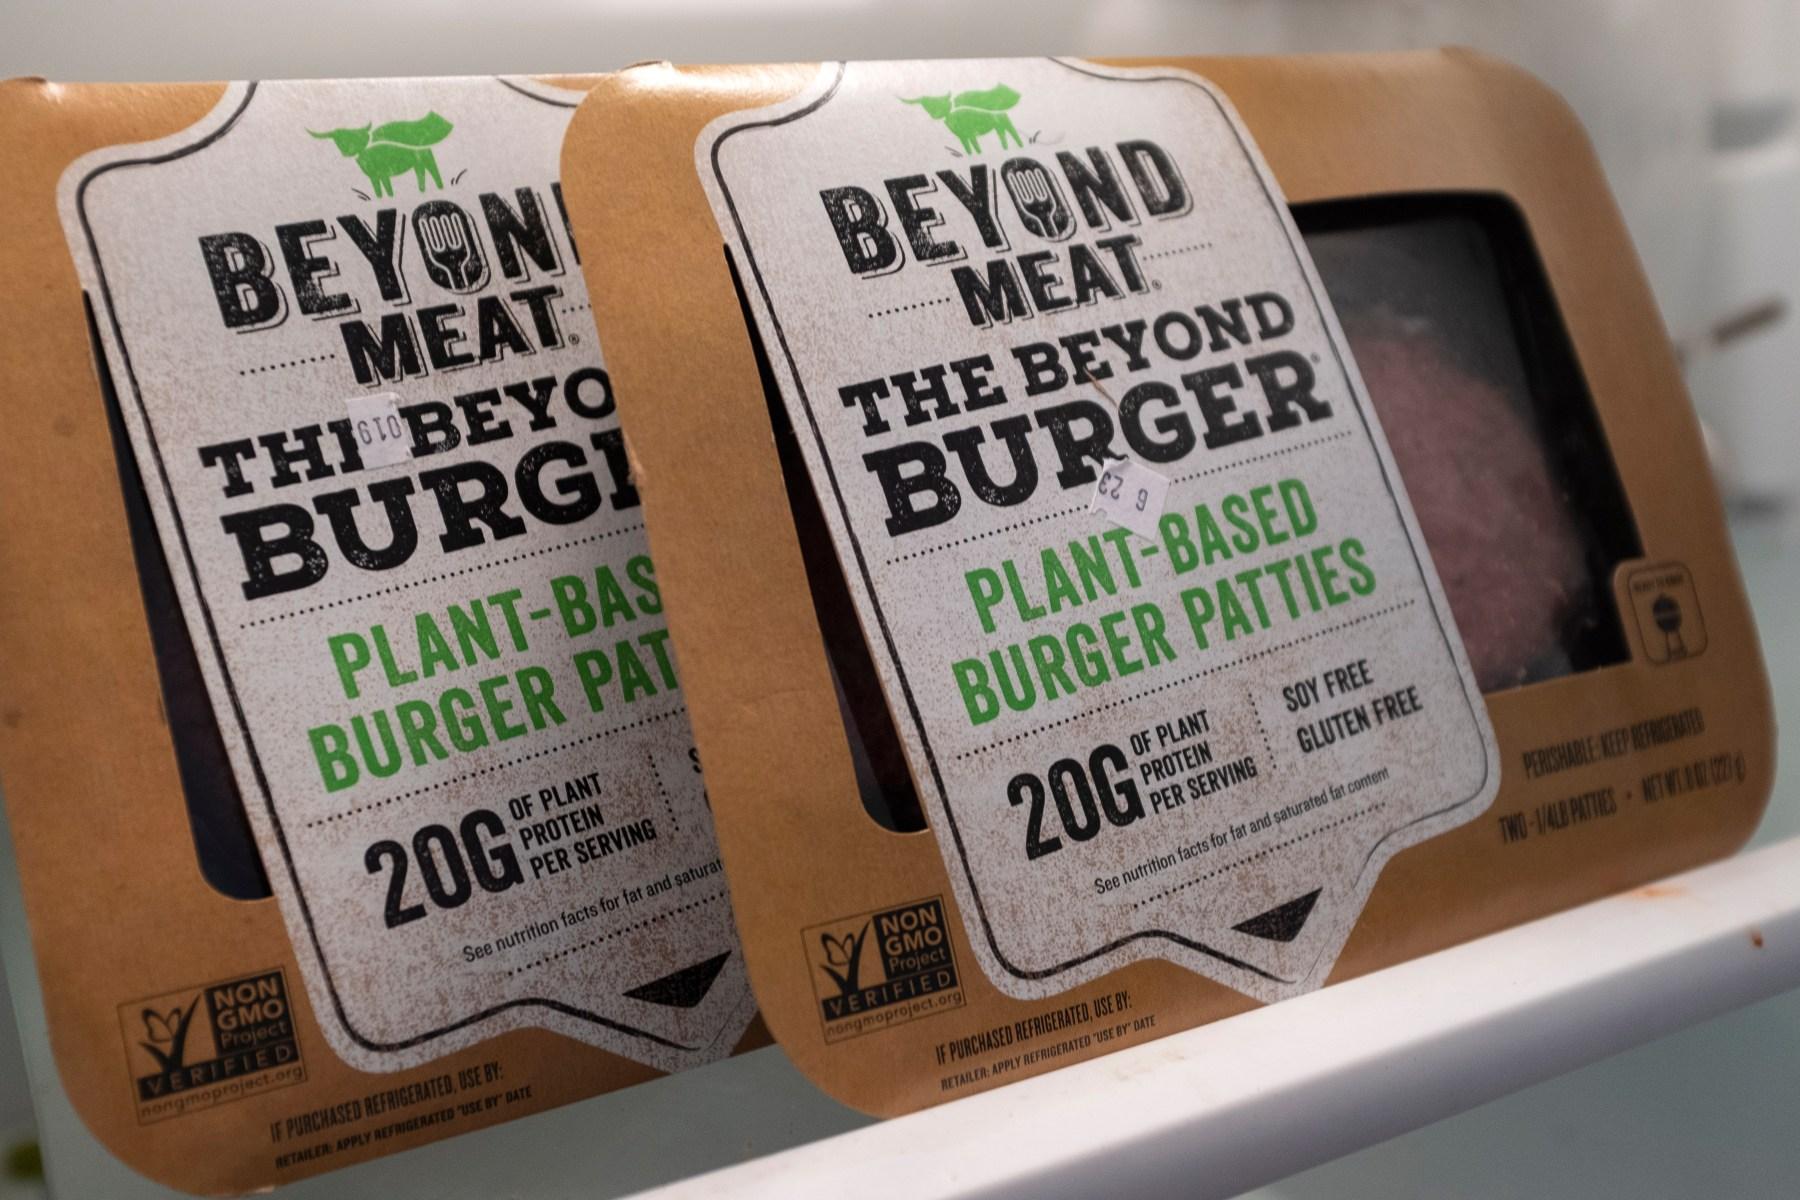 Meatless Burger Maker Beyond Meat